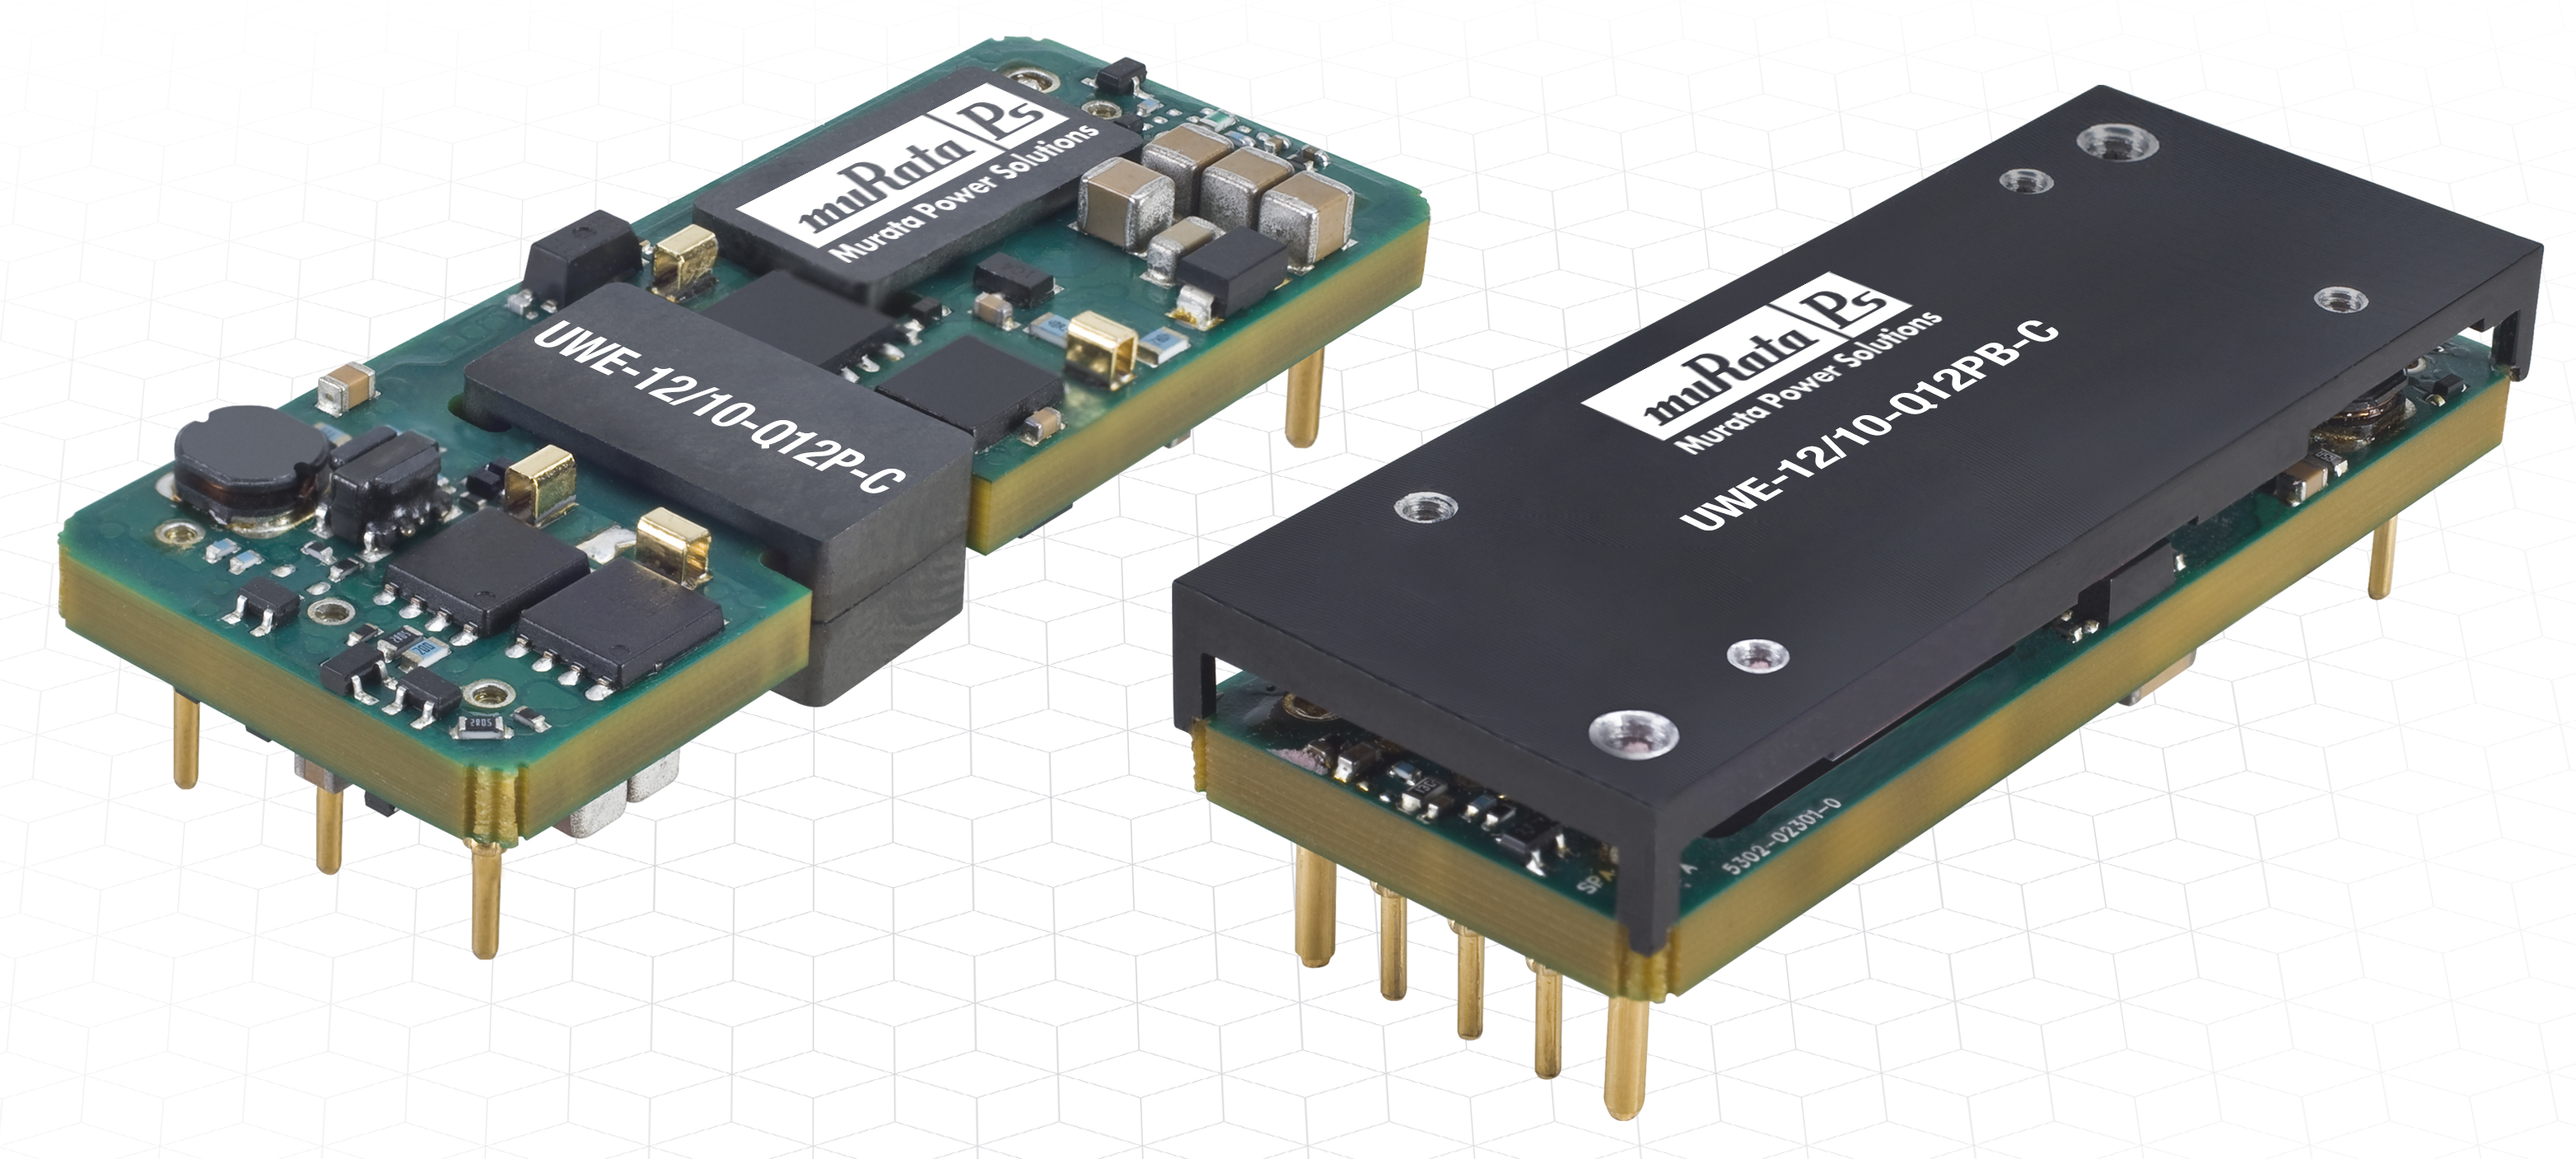 Uwe 12 10 Q12 Muratas Eighth Brick Dc Modules Have Ultra Wide Ac Powered Led Circuit 120w Flood Lights Enkonn Technology Co Ltd